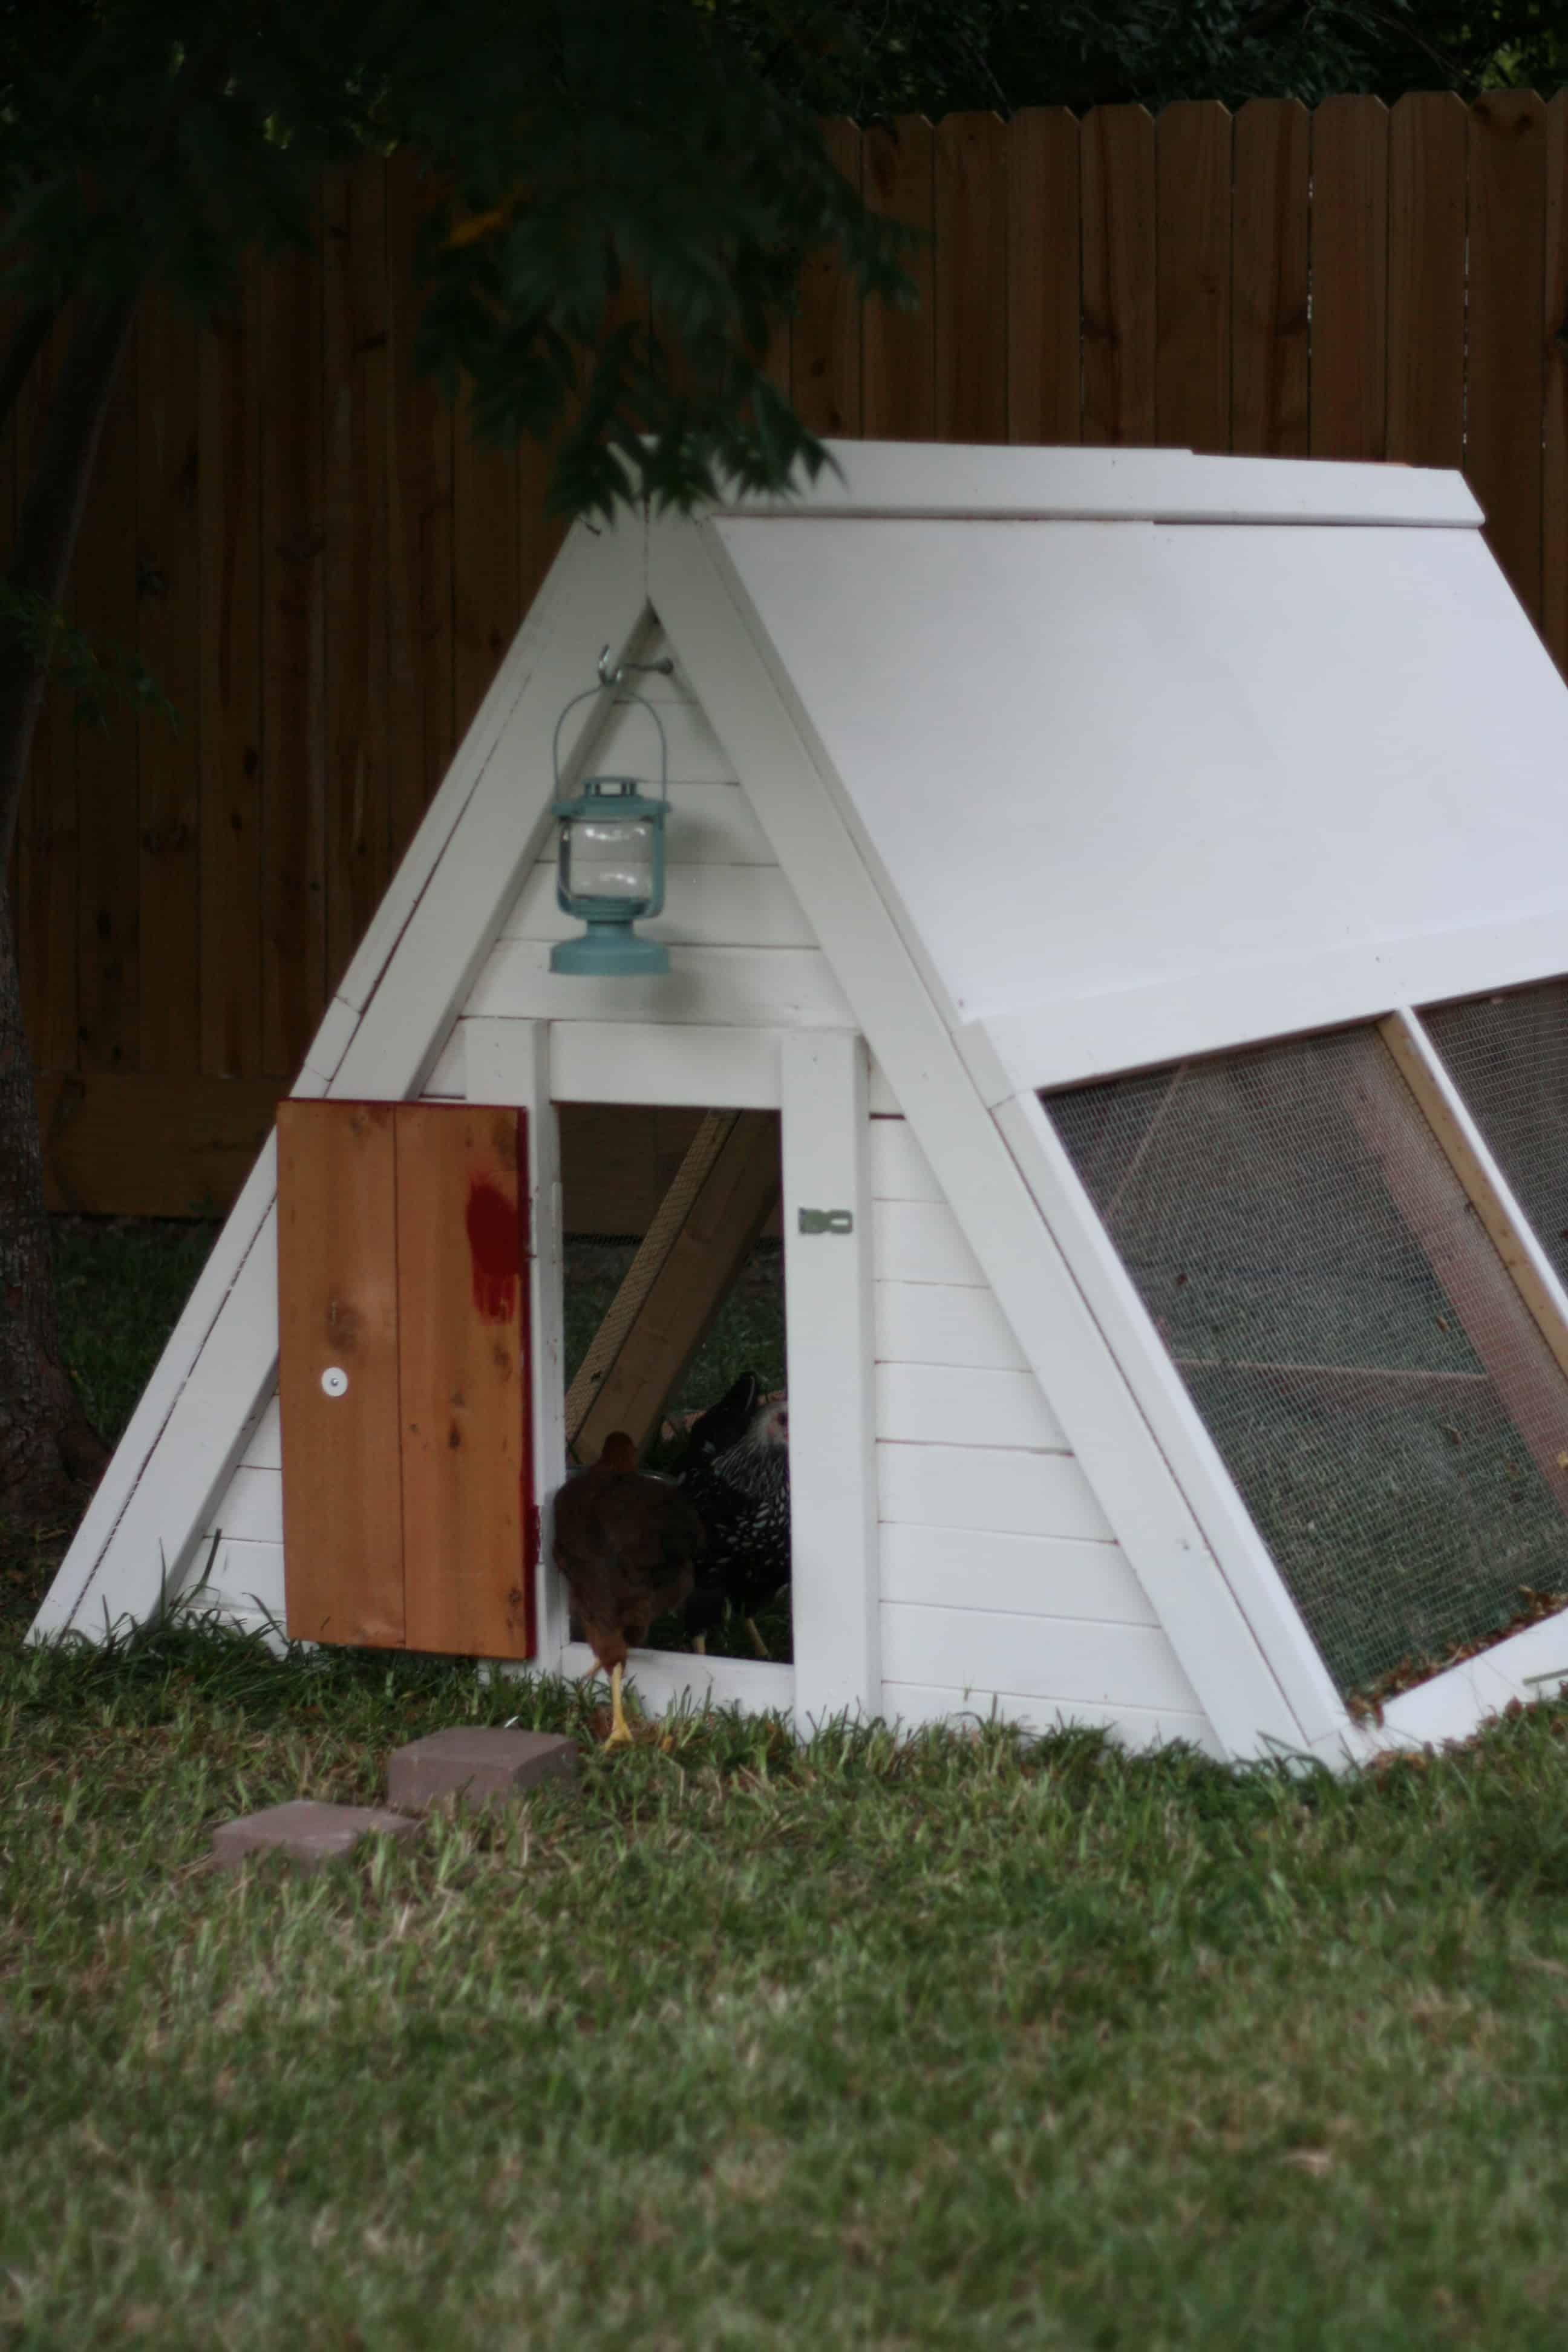 Tent style chicken coop